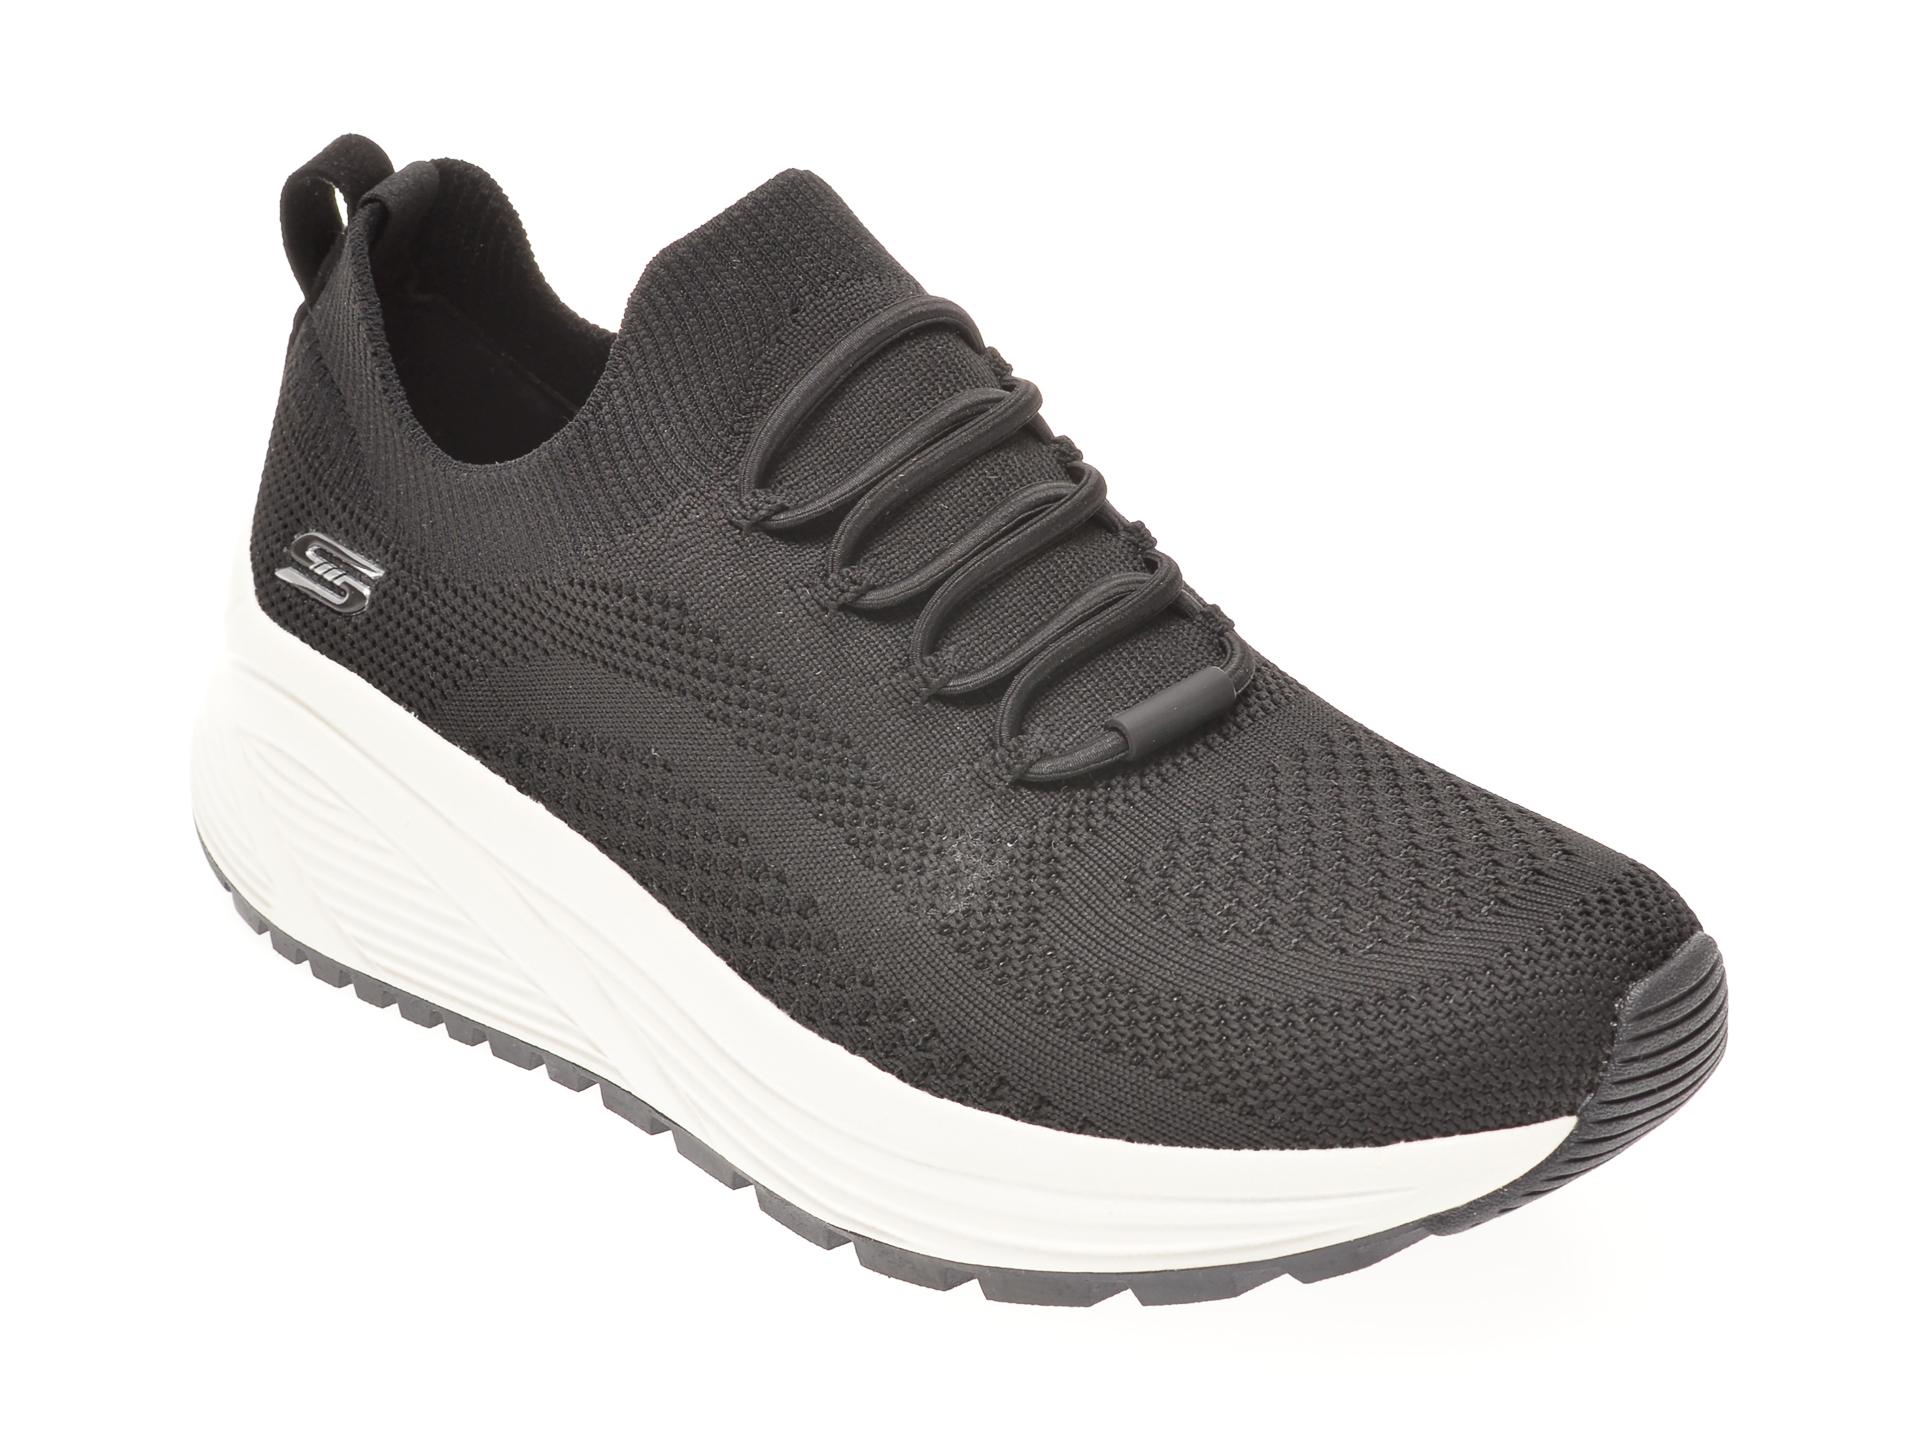 Pantofi sport SKECHERS negri, BOBS SPARROW 2.0 ALLEGIANCE CREW, din material textil